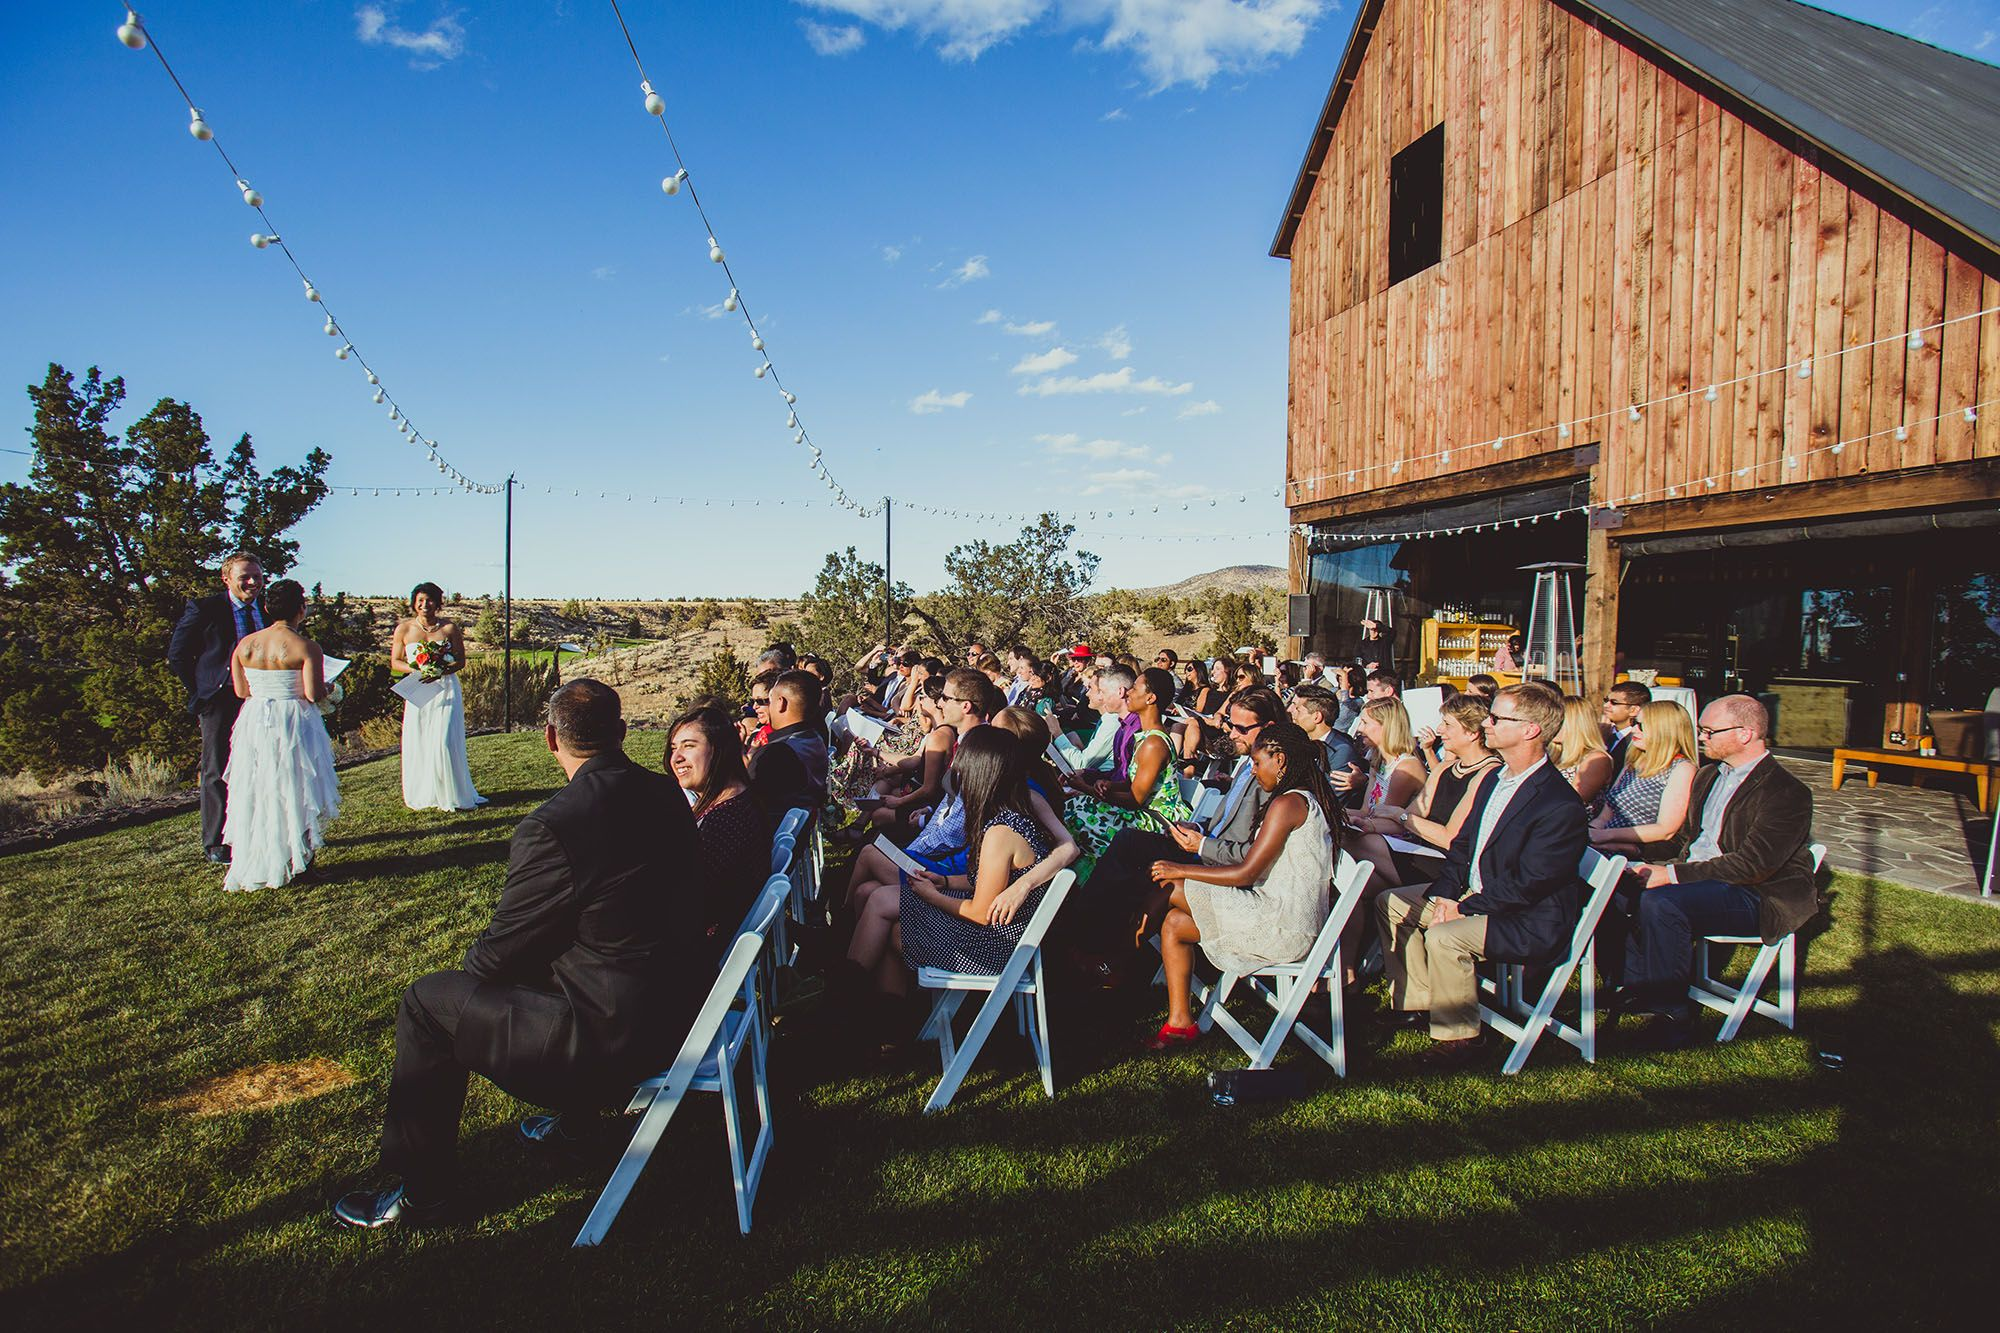 Jackie and Sarah The Barn Wedding Venue 3 | Wedding venues ...